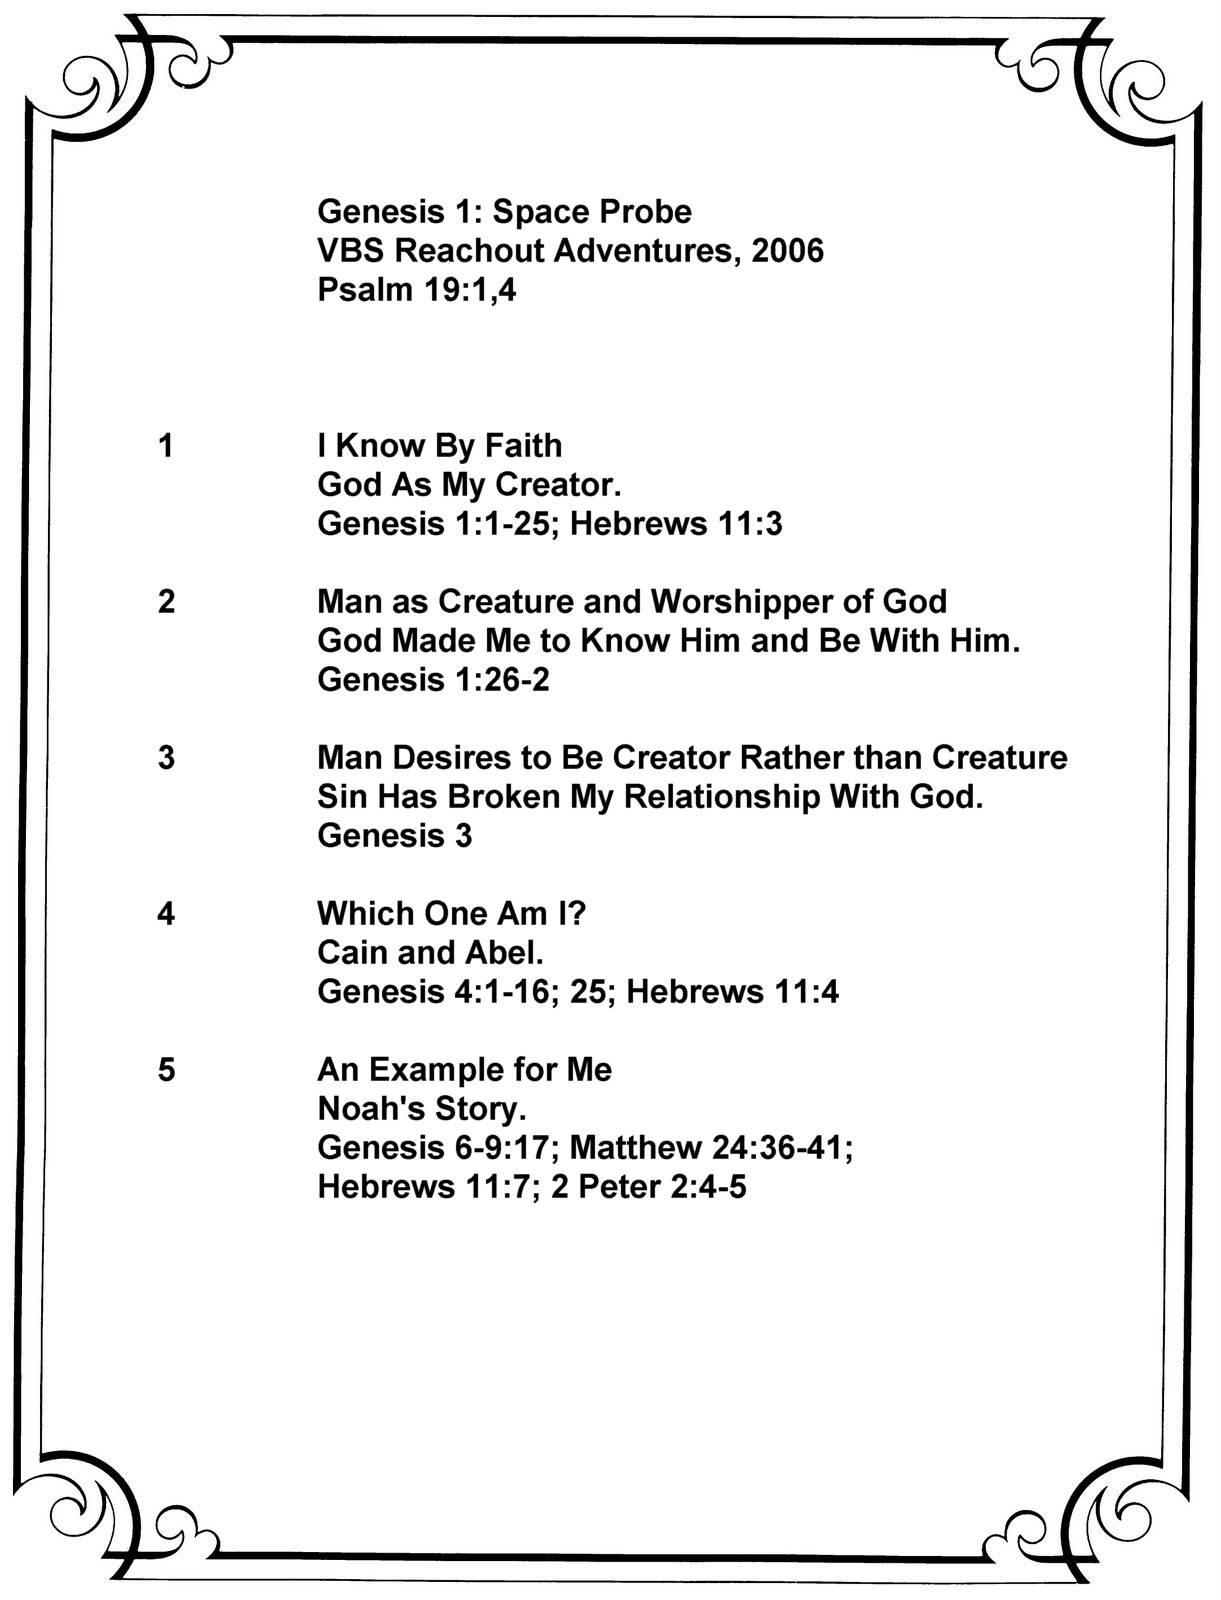 Genesis 1; Space Probe Summary